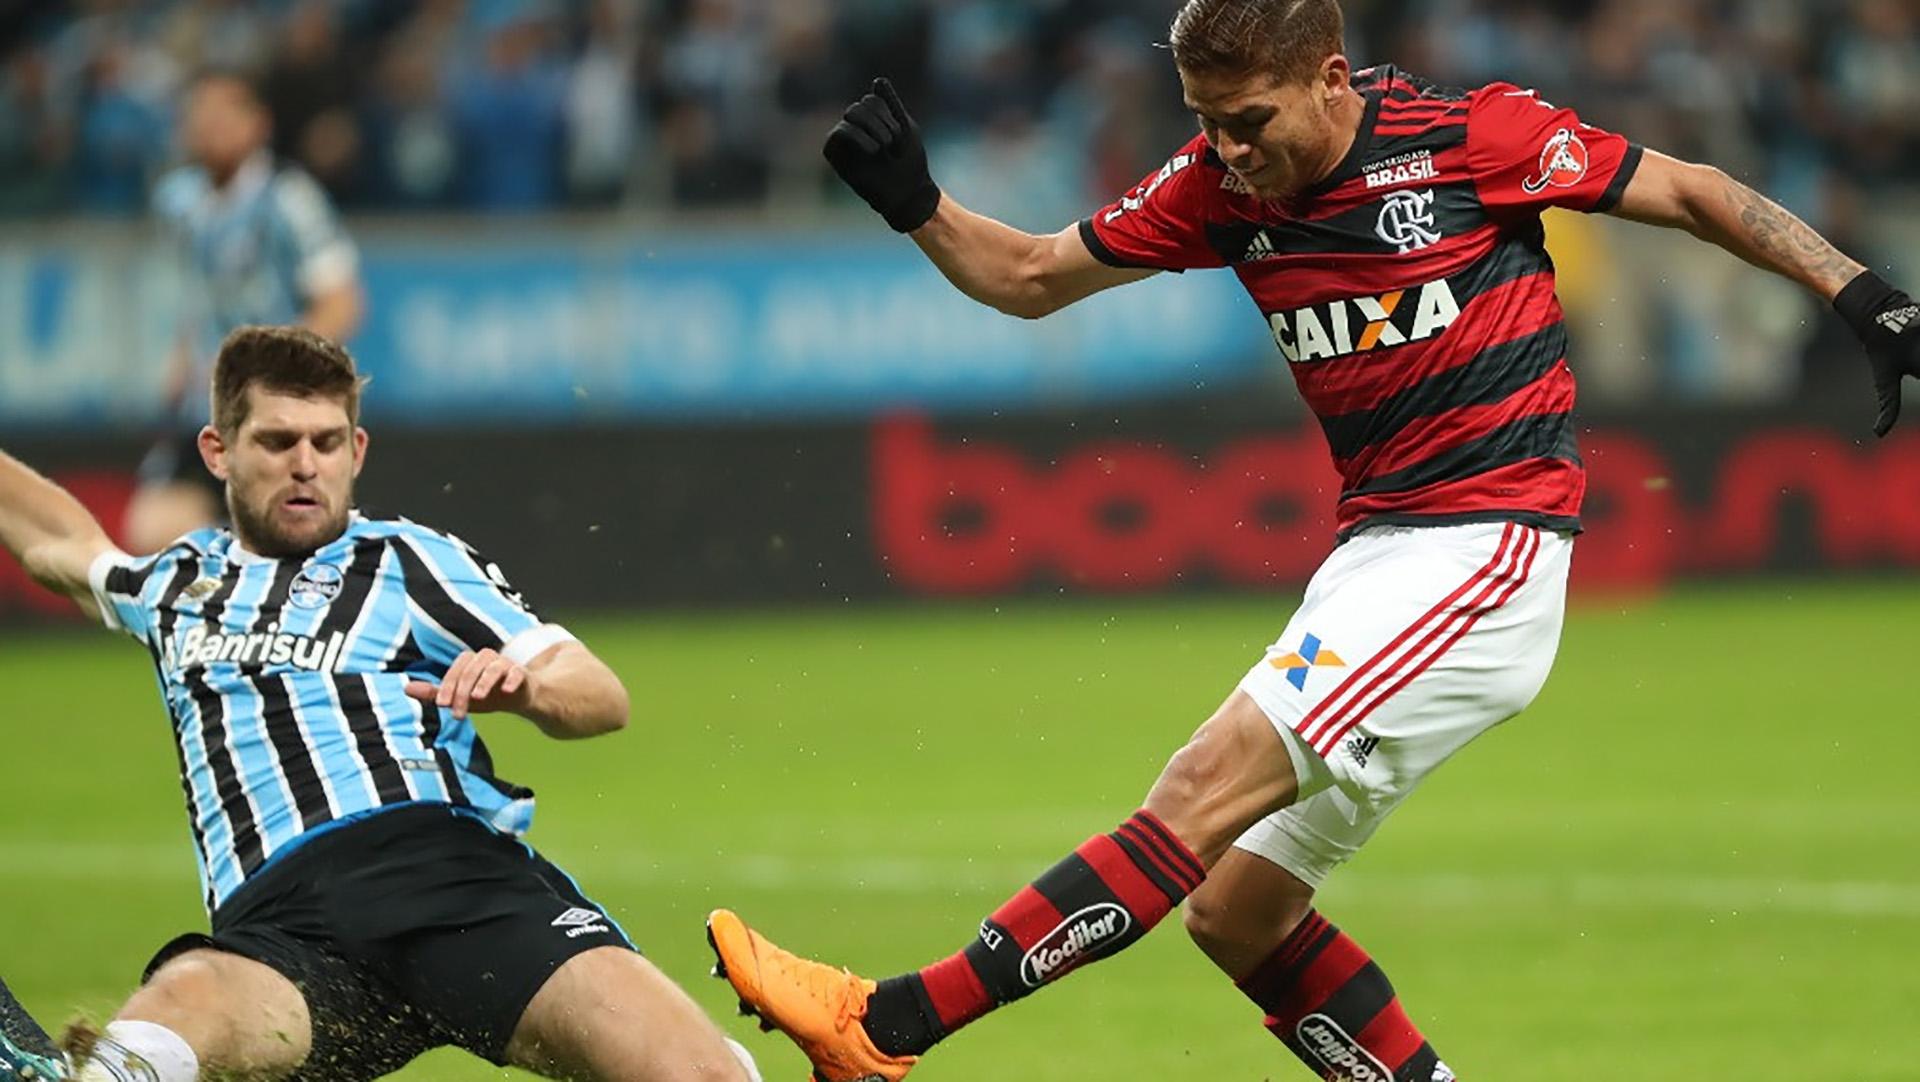 Cuellar Kannemann Gremio Flamengo Copa do Brasil 01082018